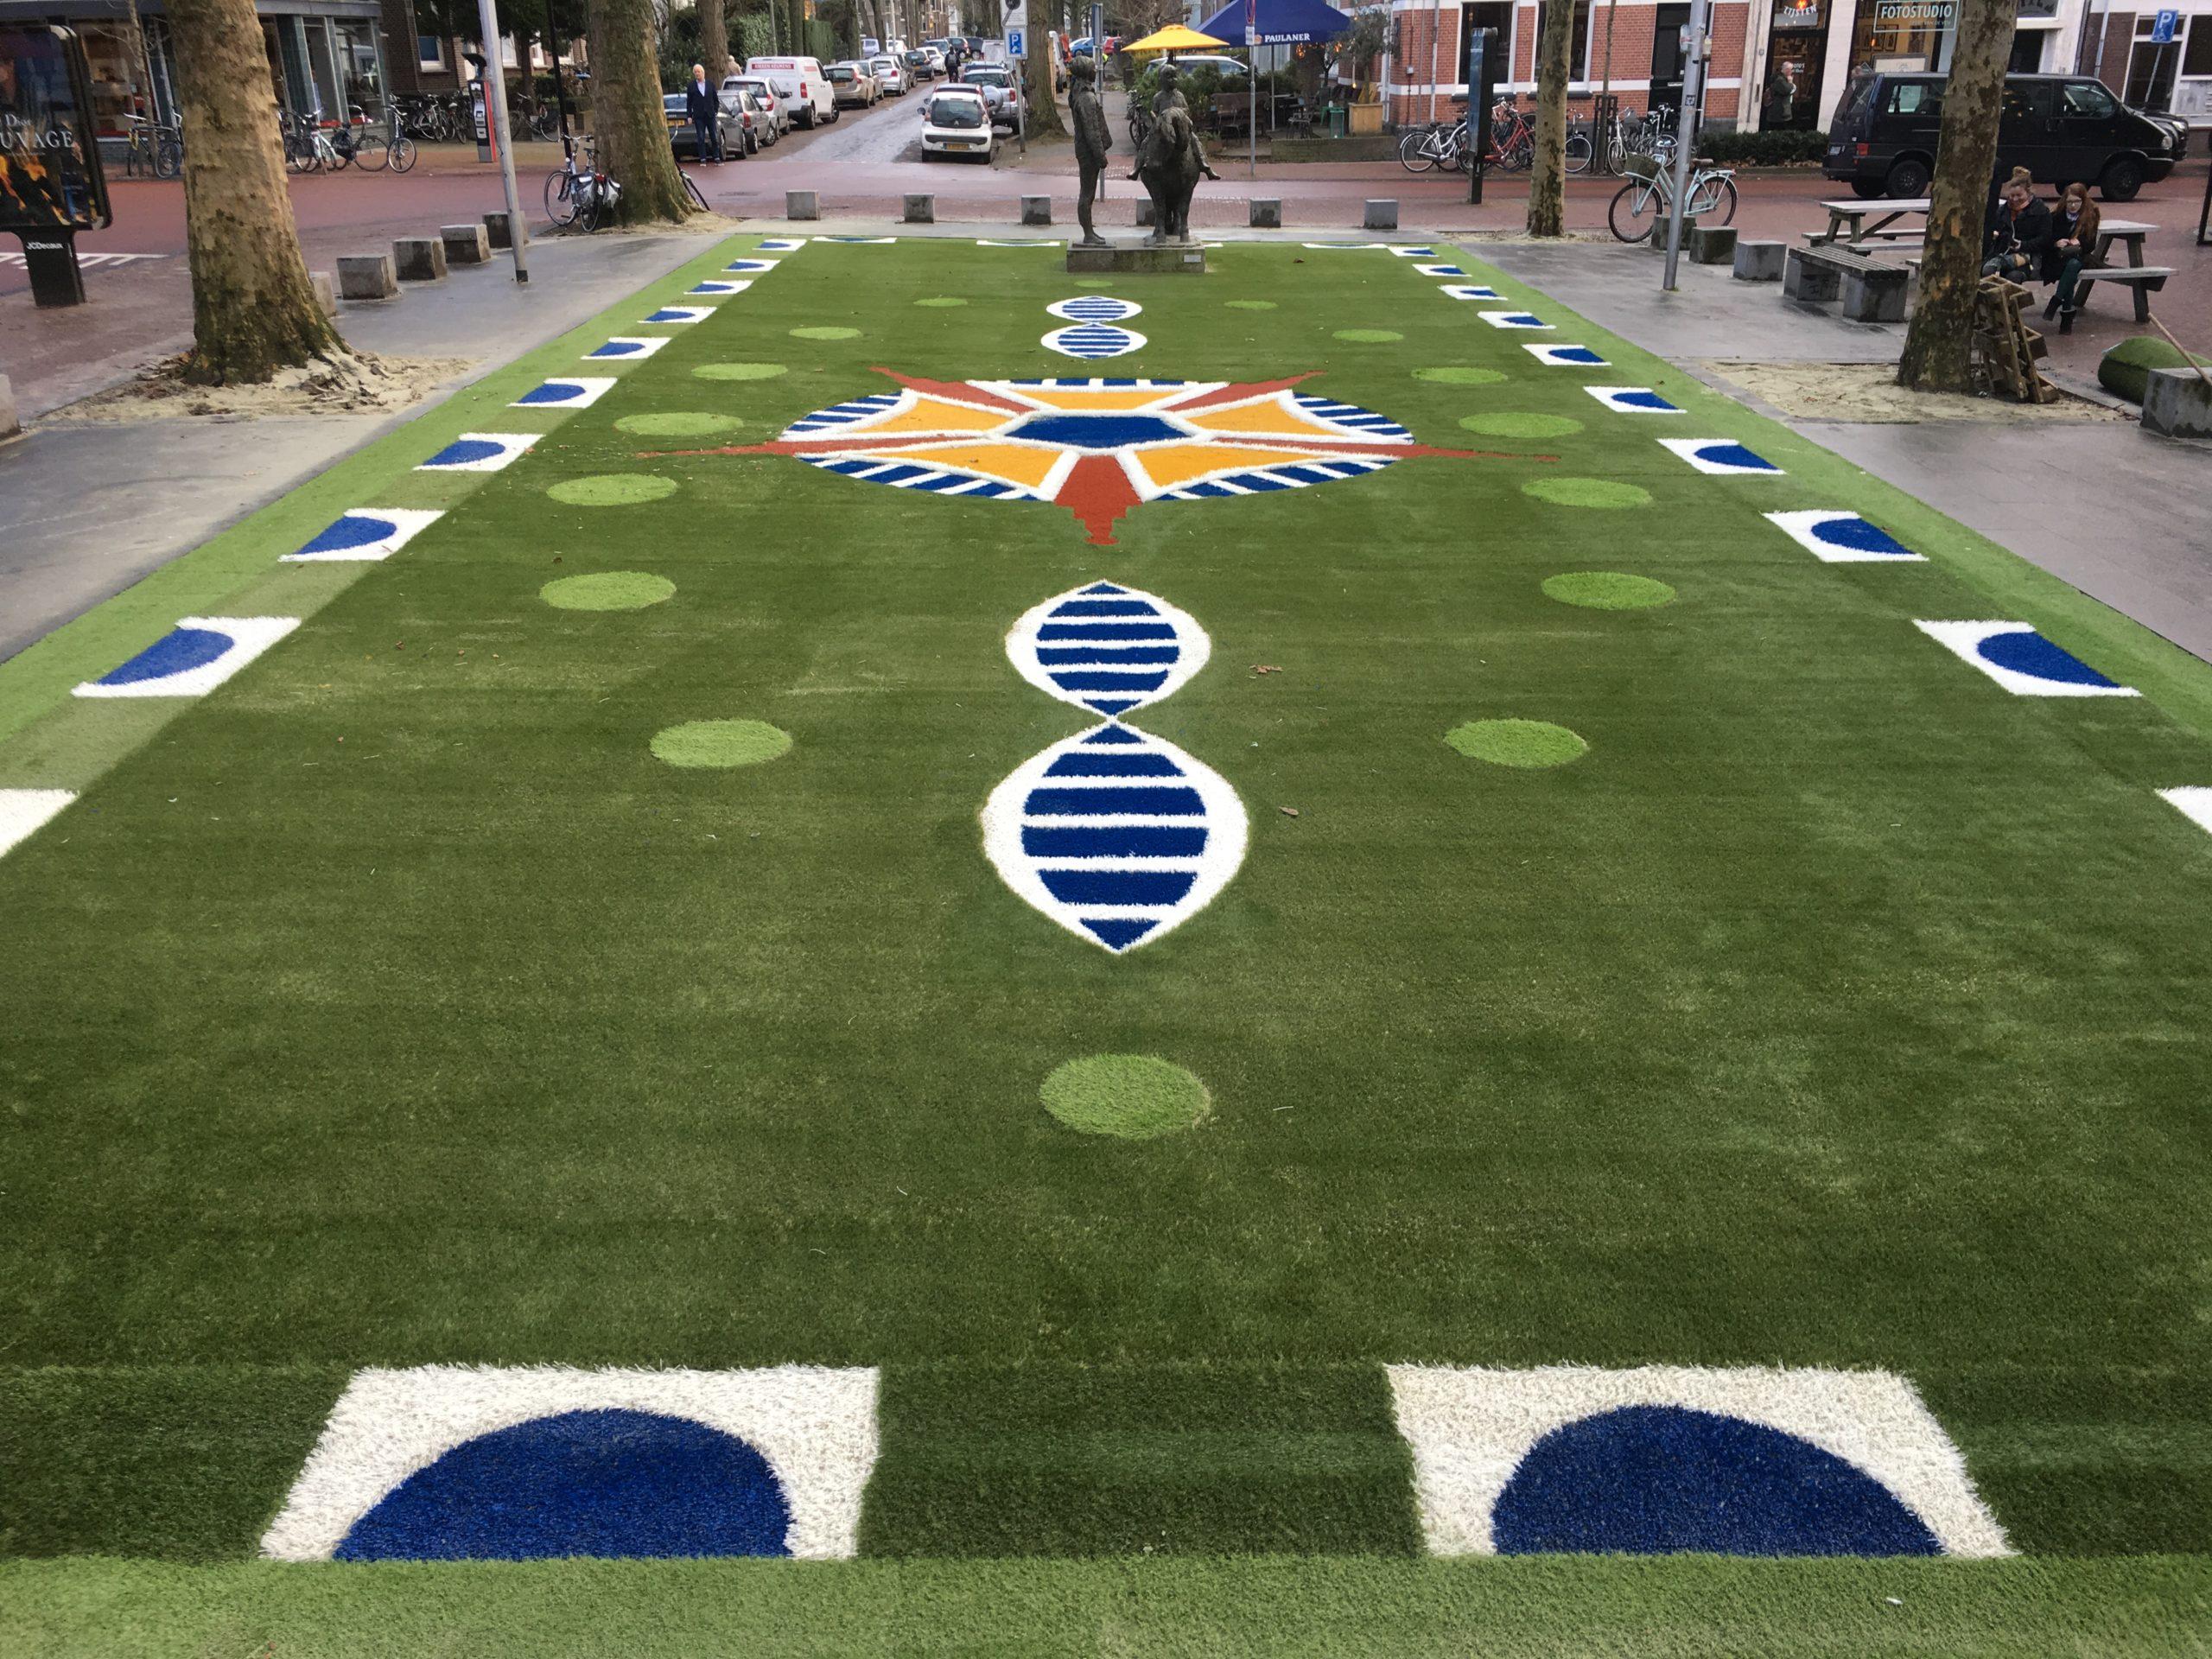 Nijmegen Flying Grass Carpet